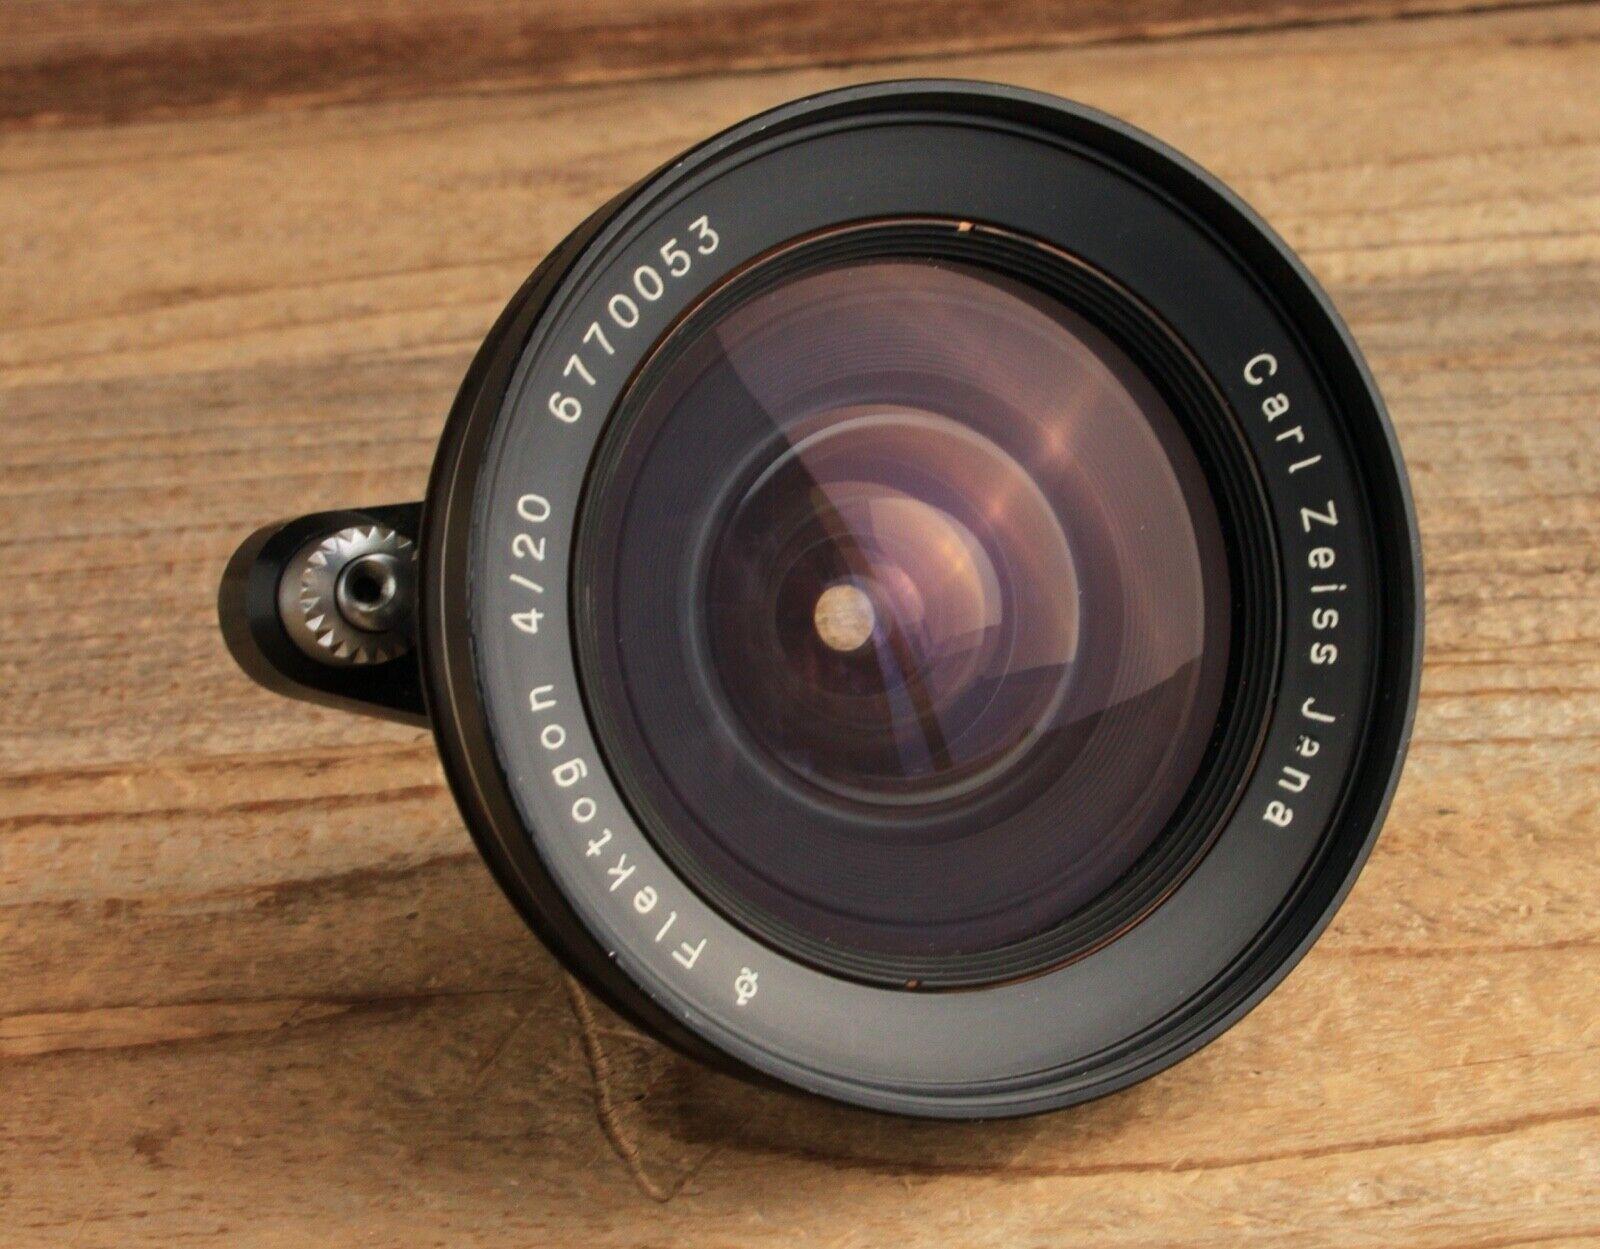 Vintage Carl Zeiss Flektogon F4 20mm Exakta Mount Camera Lens - $189.50